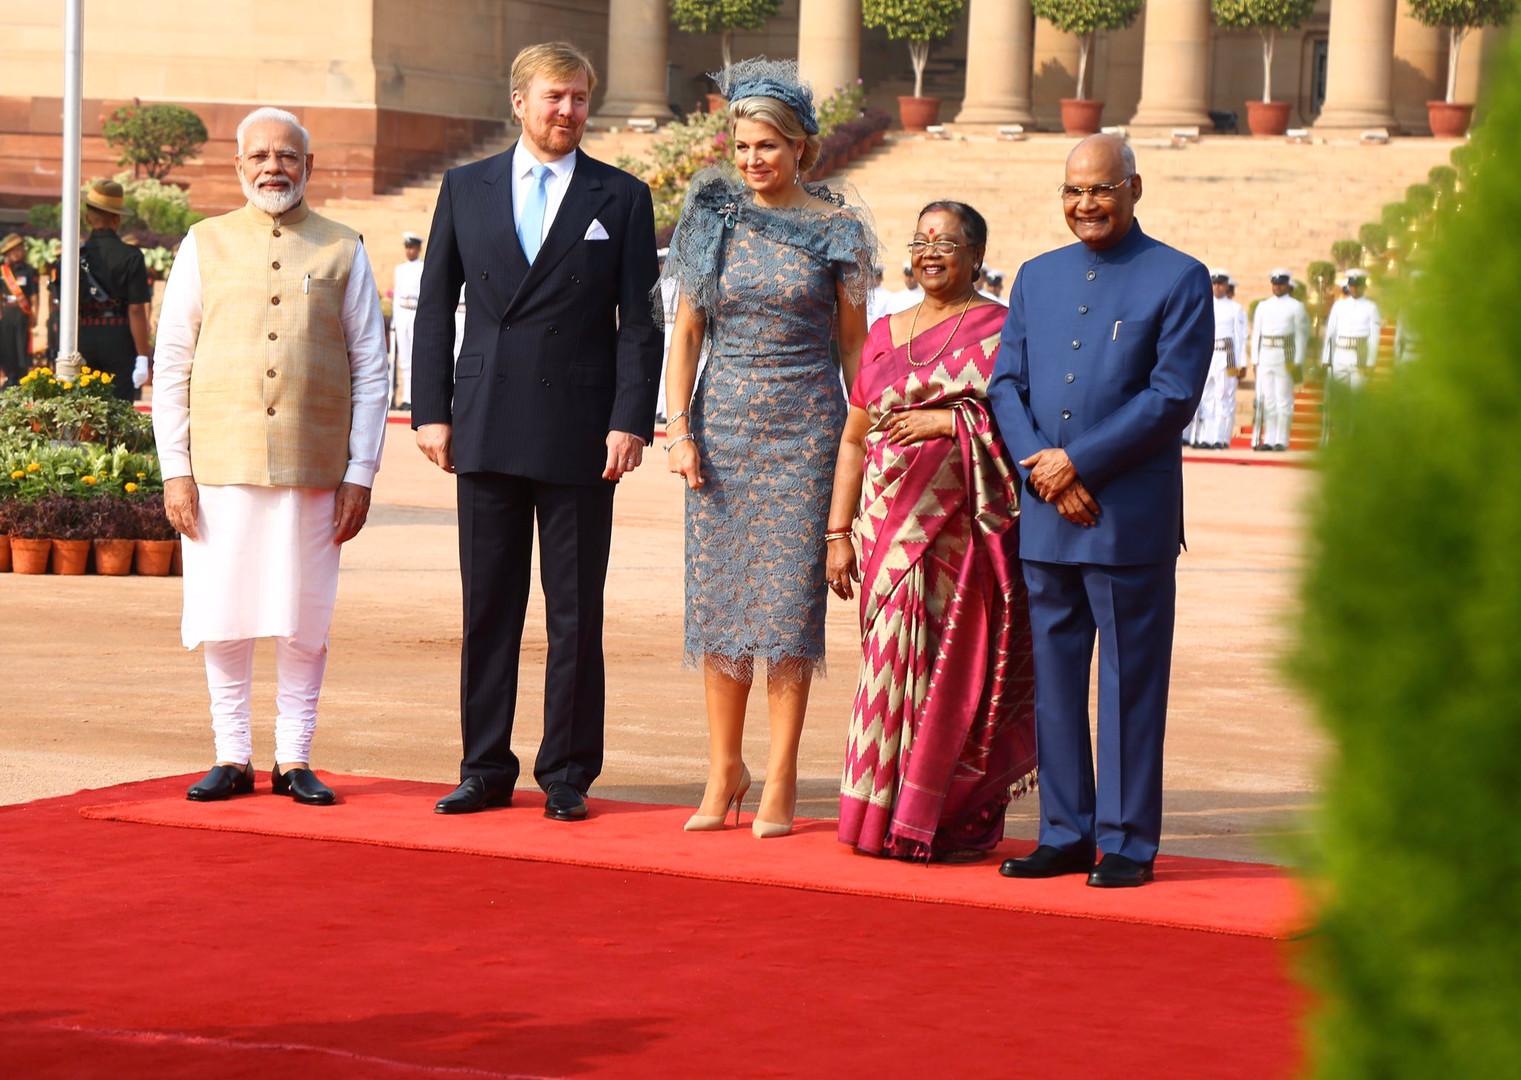 Dutch Royal Family in India.jpeg